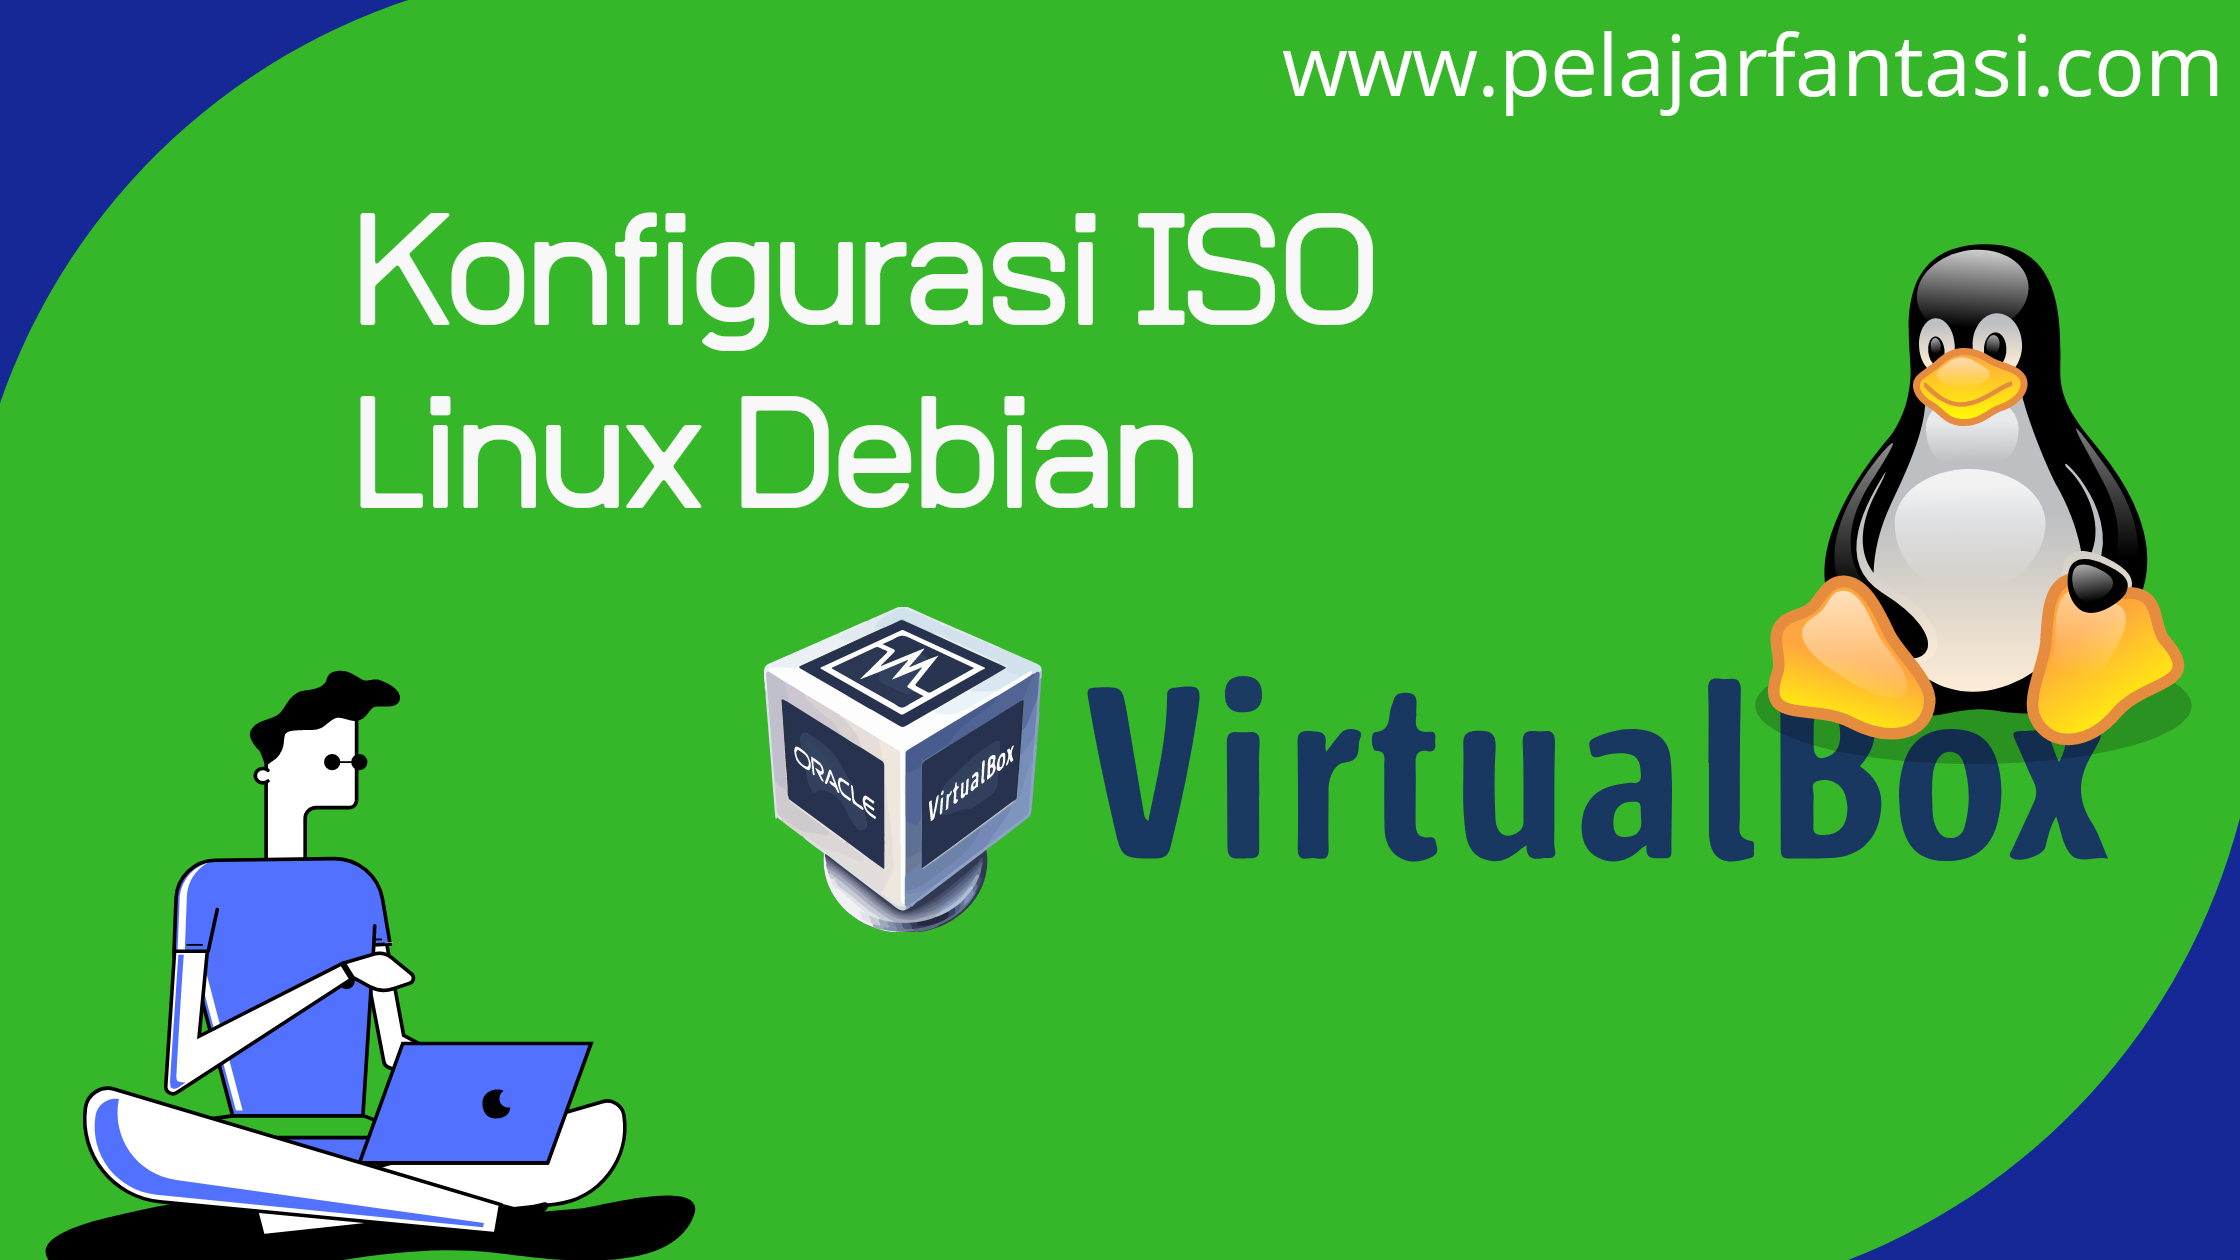 Cara Konfigurasi ISO Linux Debian di VirtualBox